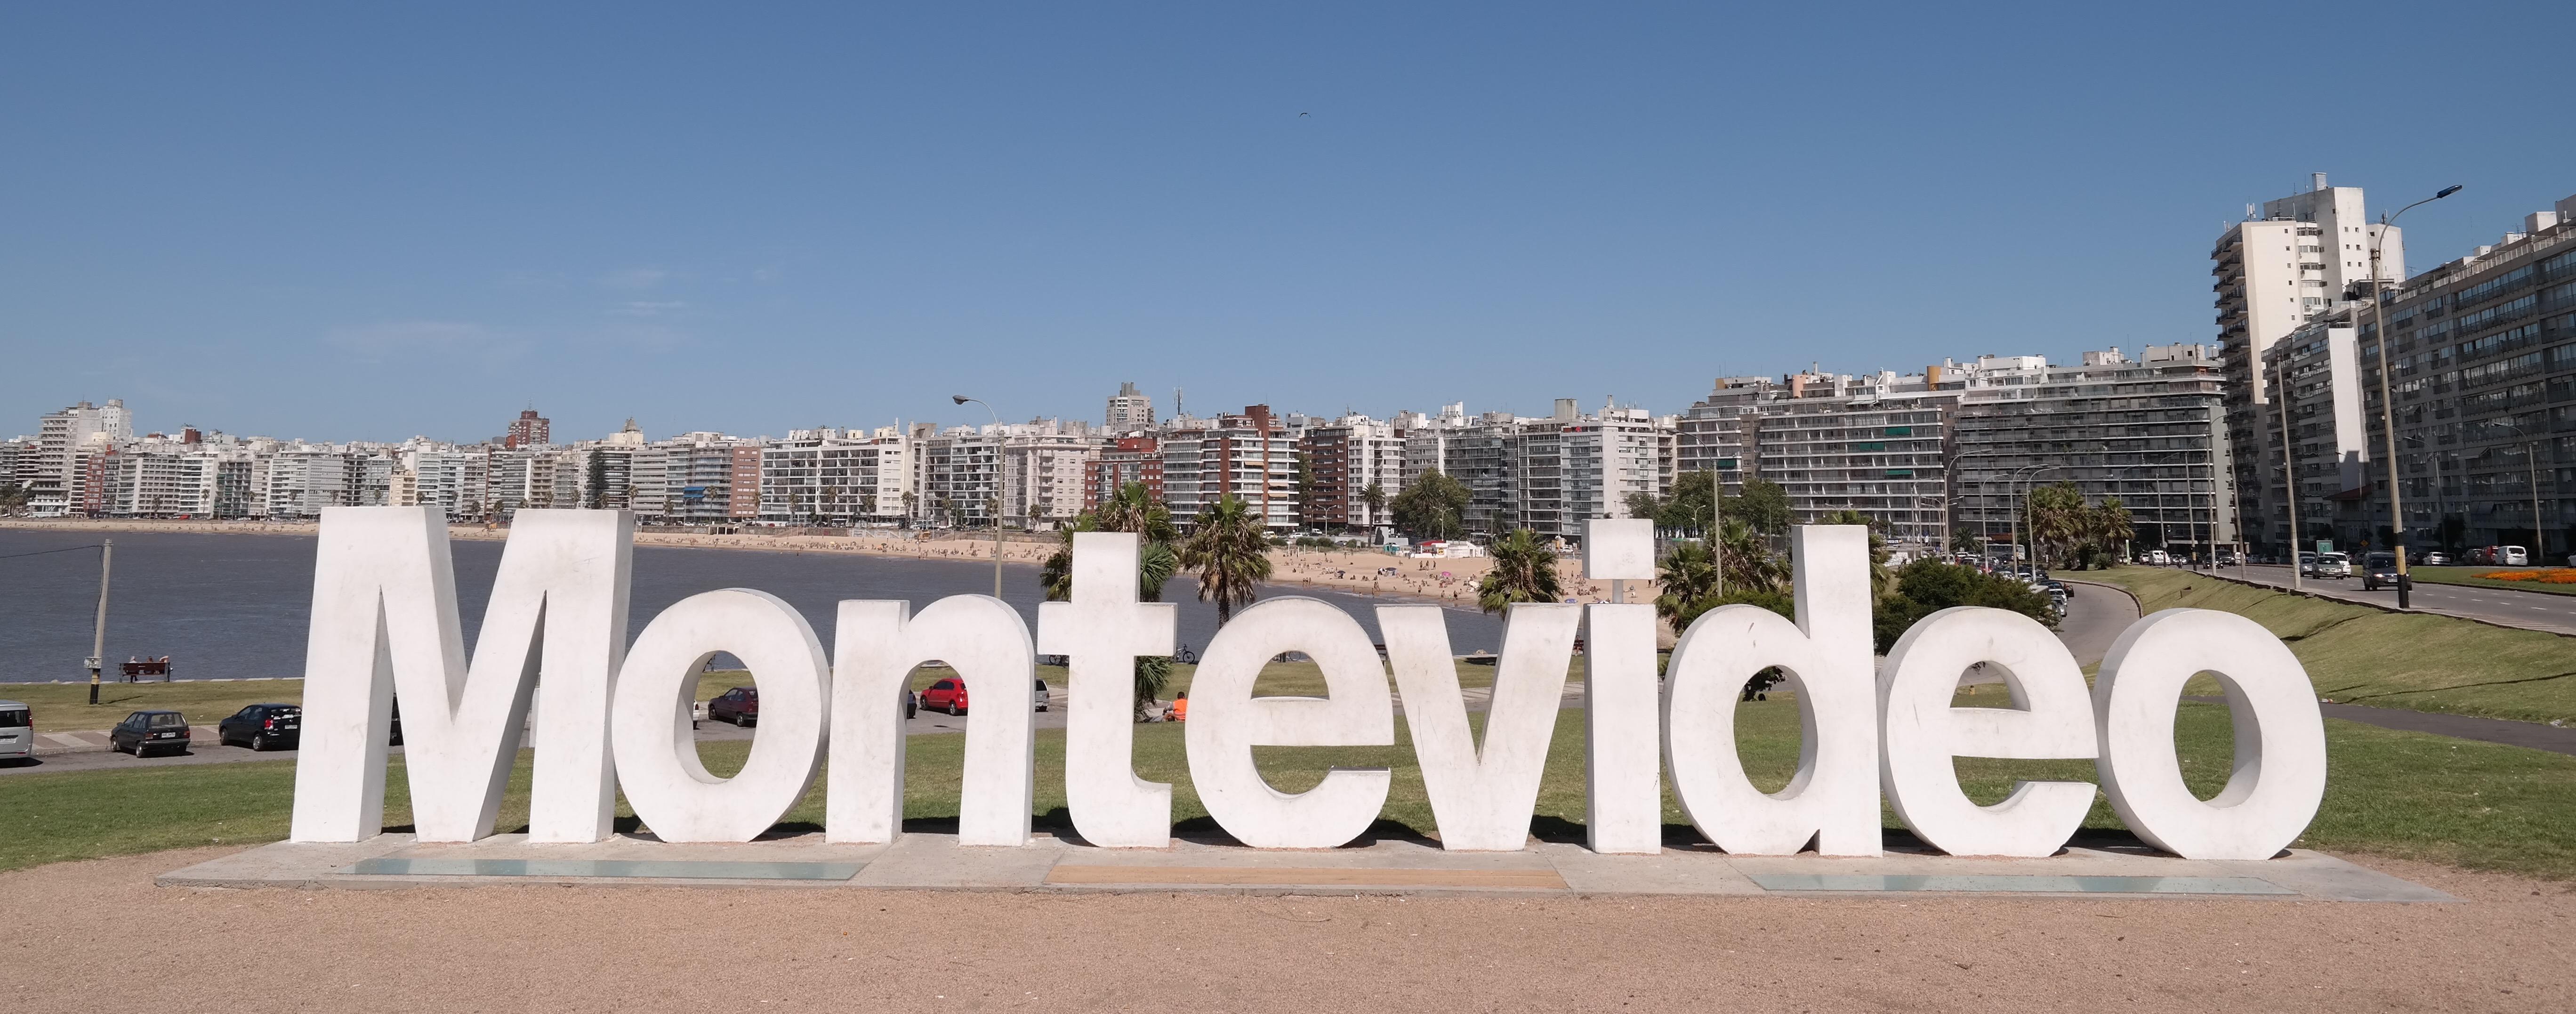 Travel Uruguay